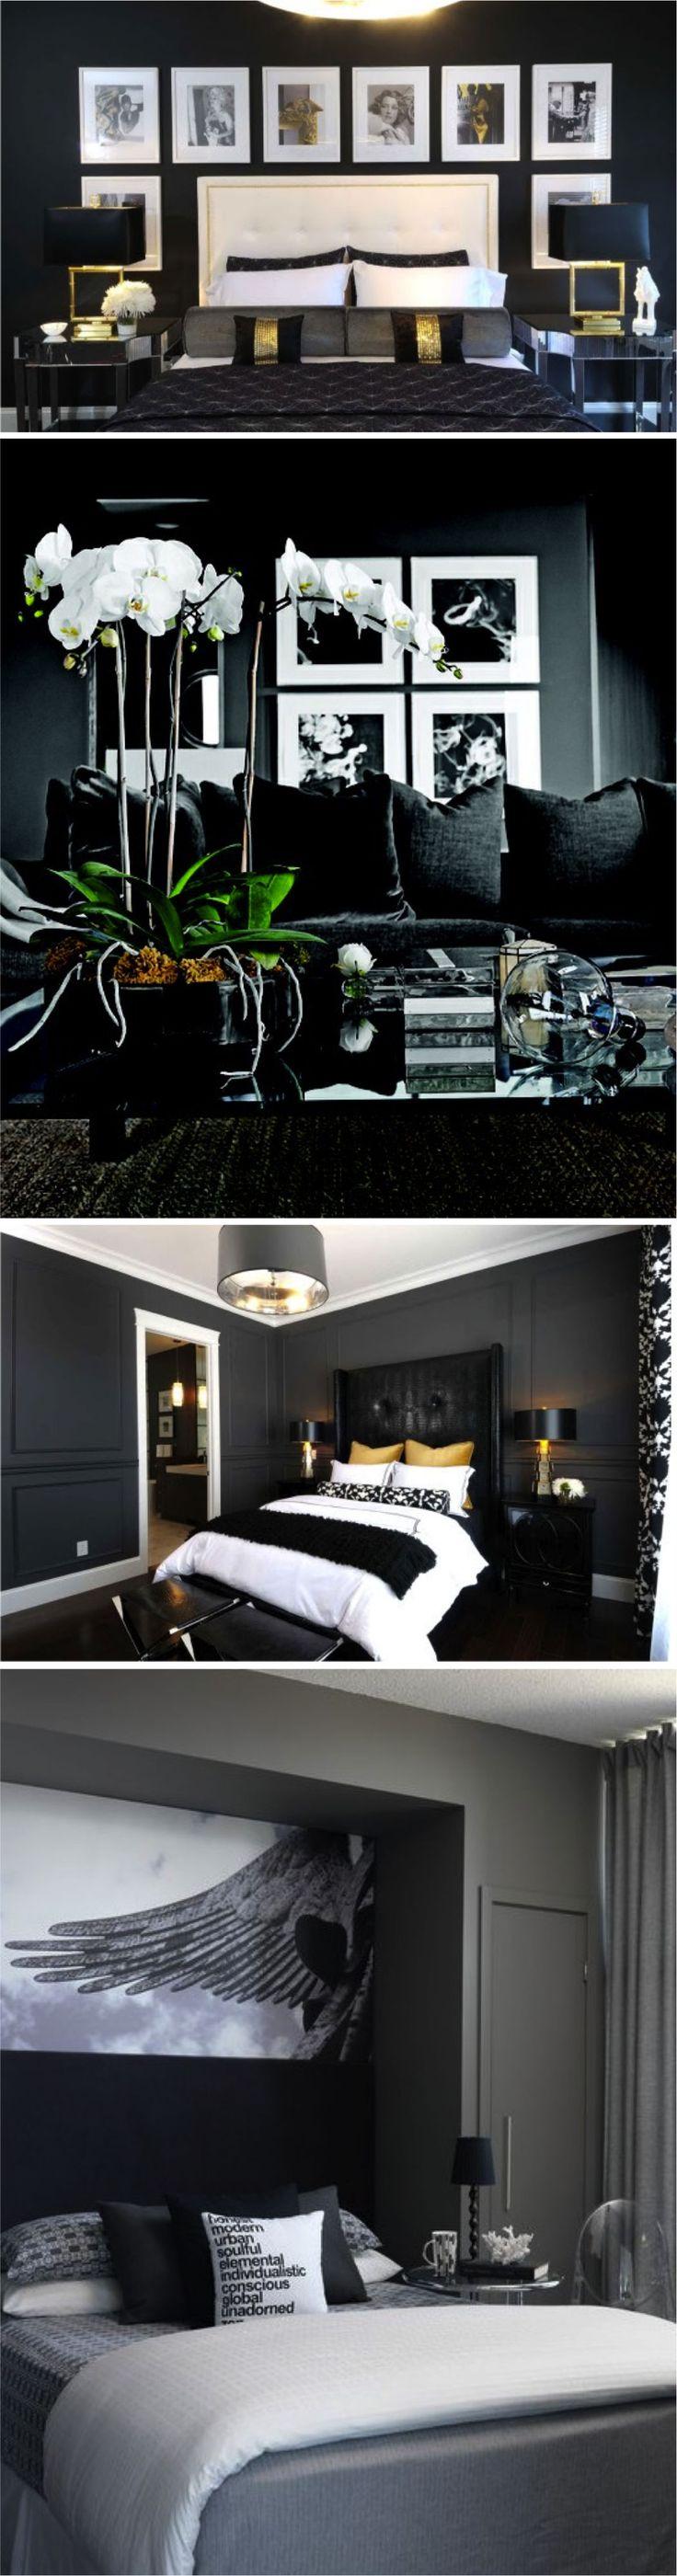 Super 17 Best Ideas About Black White Bedrooms On Pinterest Black Largest Home Design Picture Inspirations Pitcheantrous